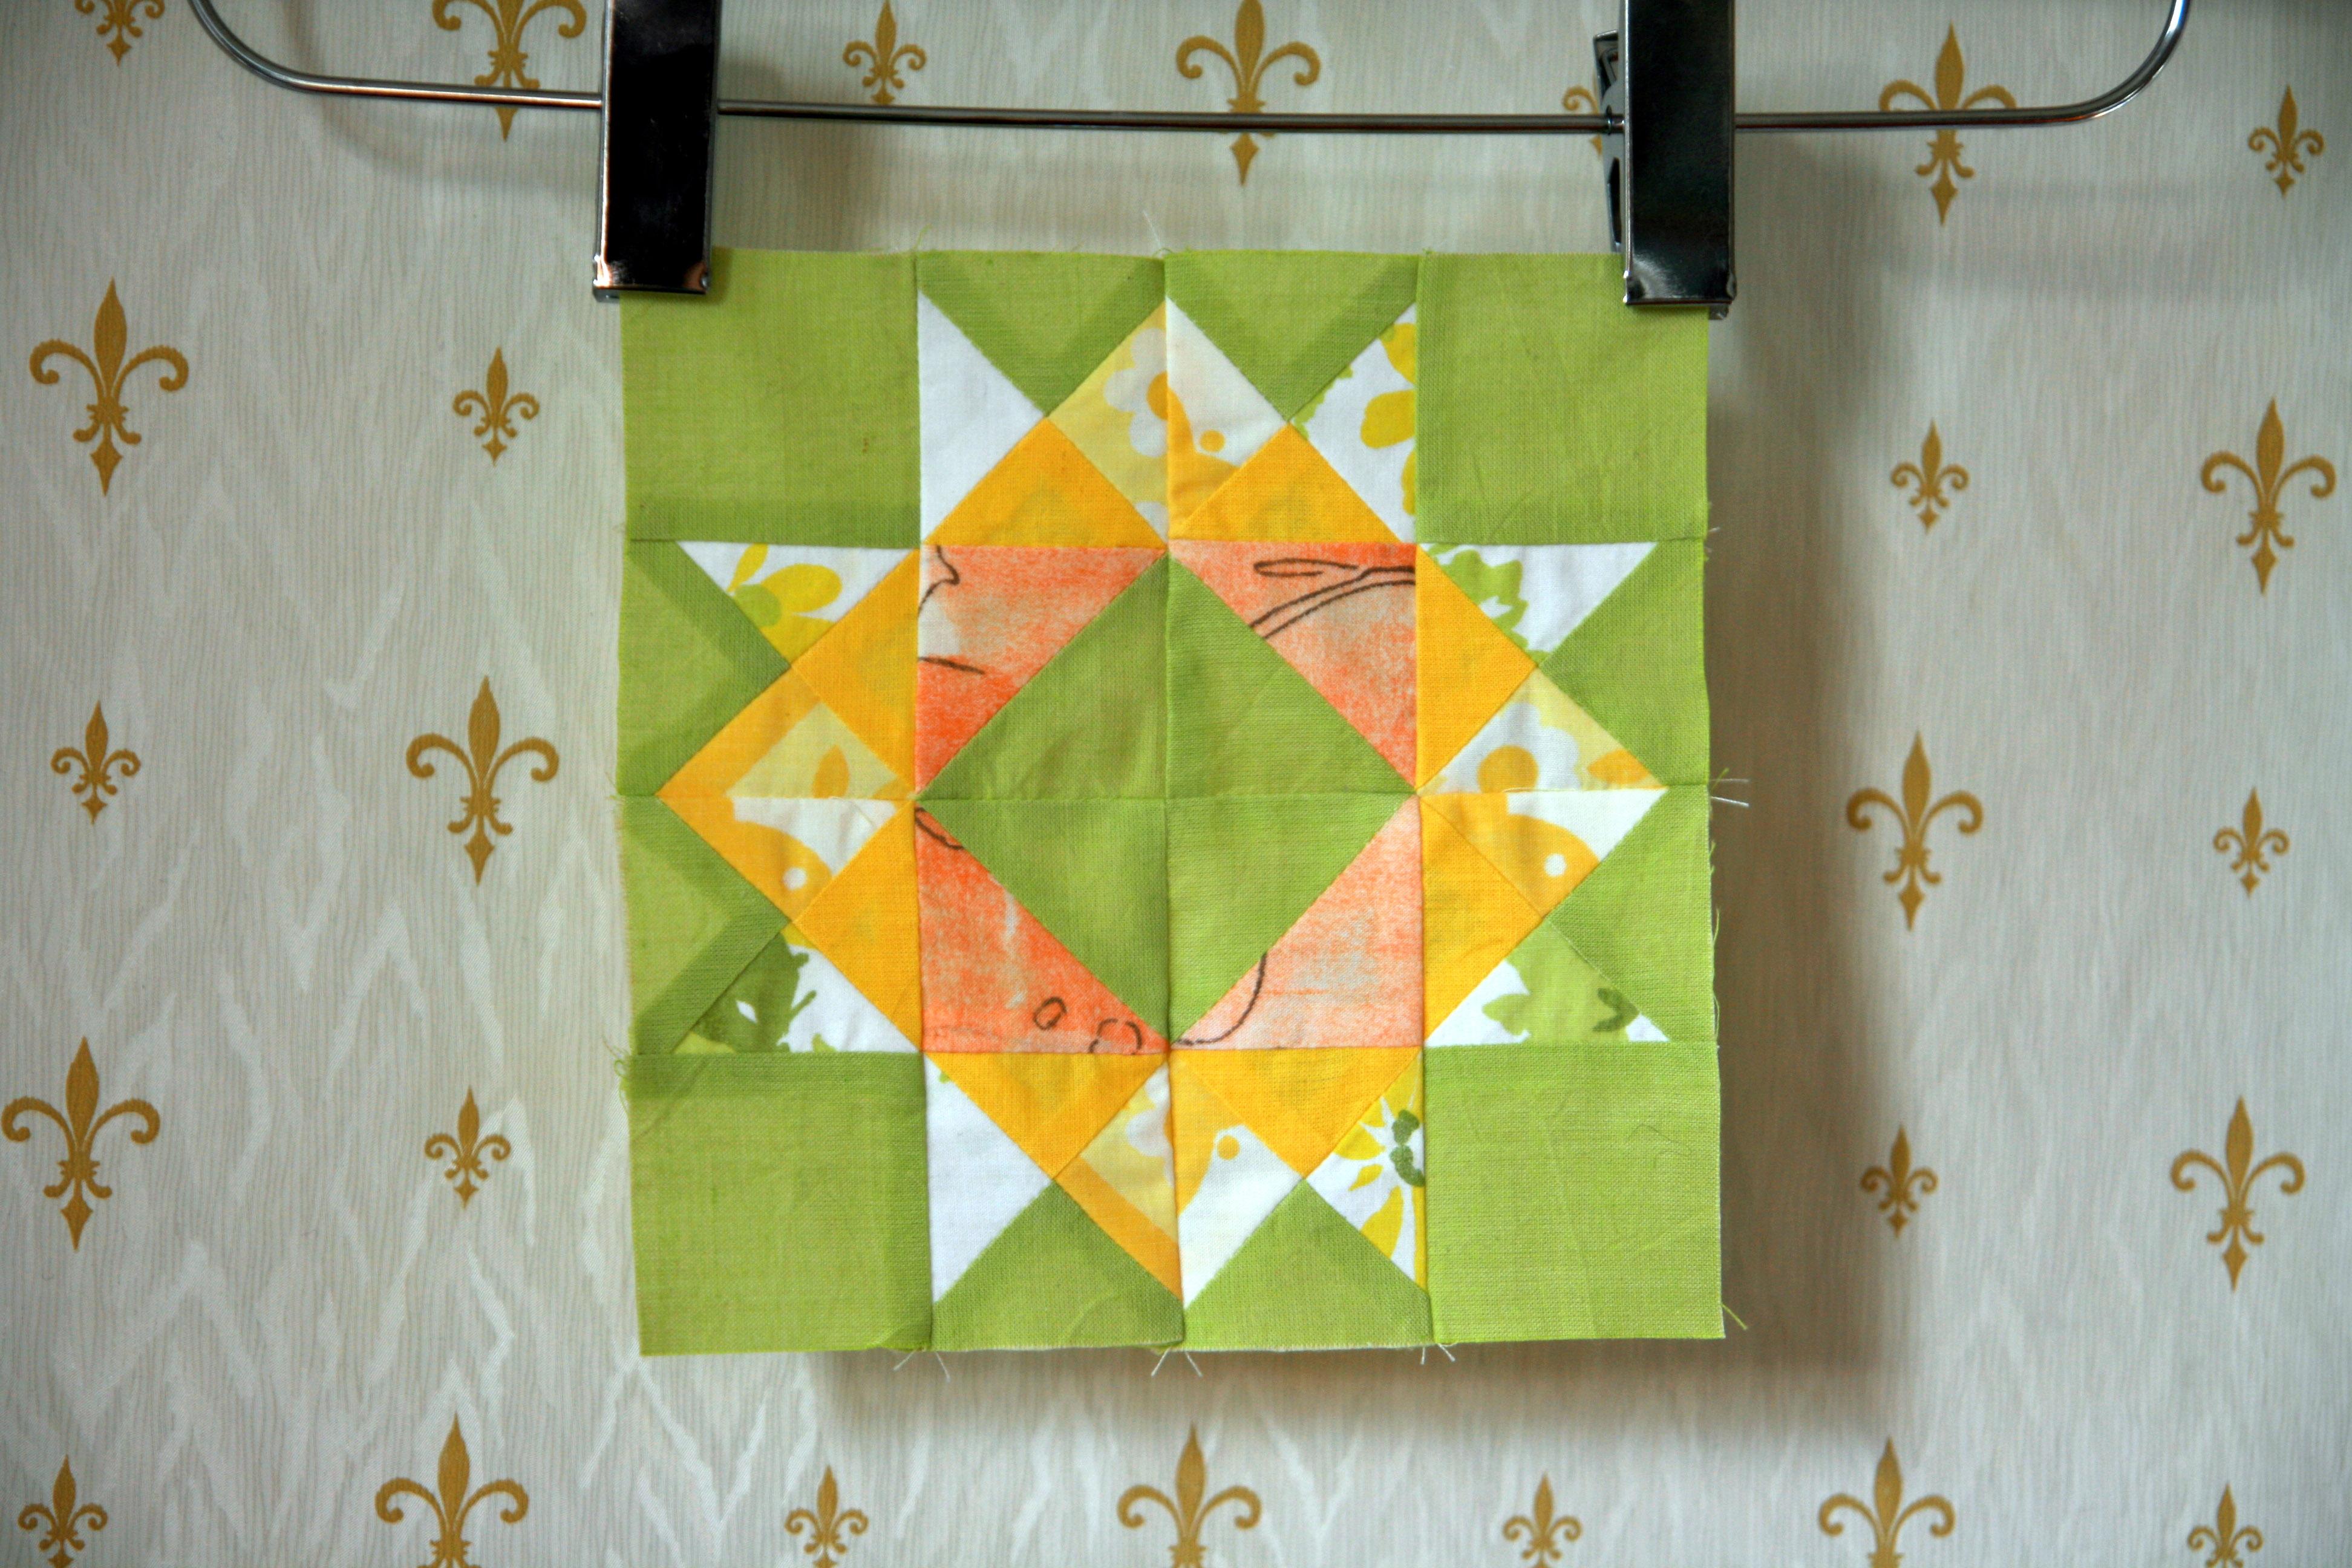 Hintergrundbilder : Dreiecke, Jahrgang, Decke, Nähen, nähen, Biene ...